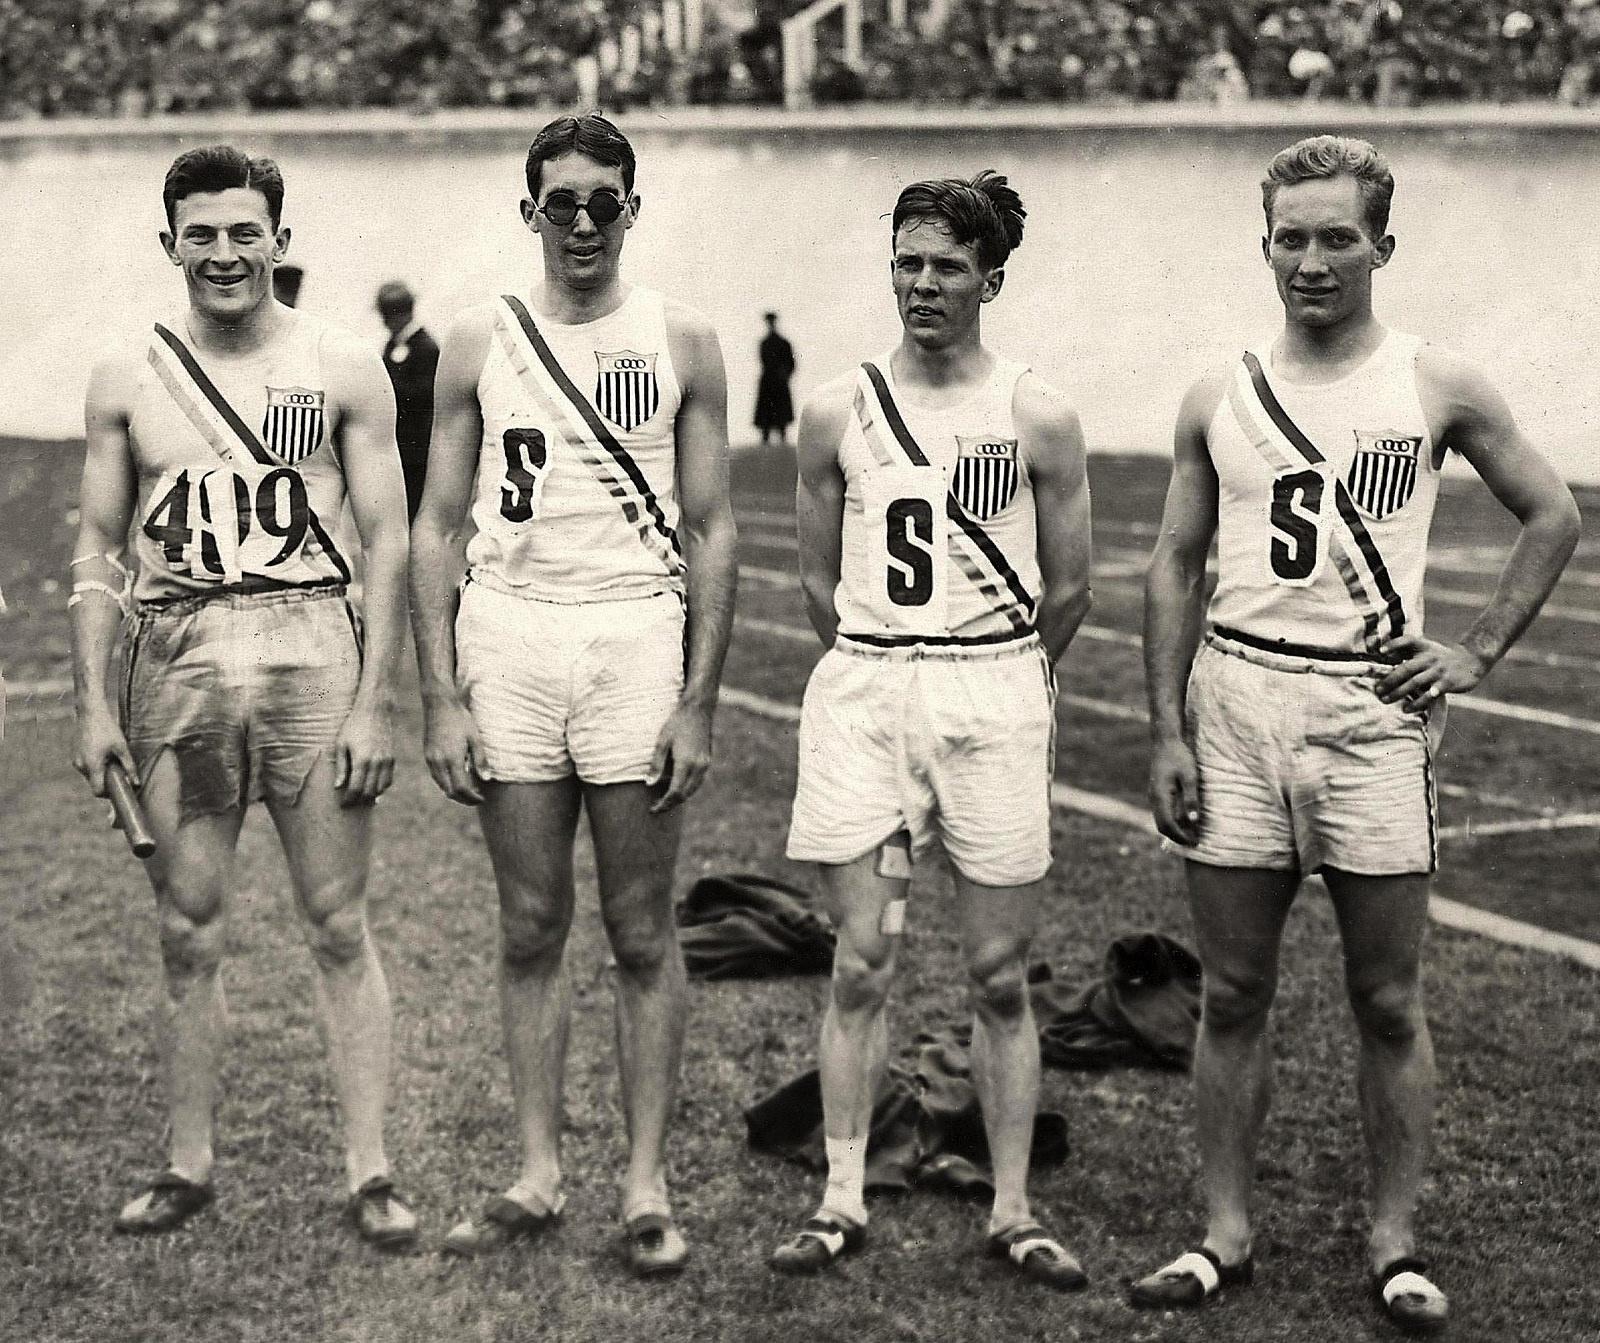 U.S. olympic relay team in 1928